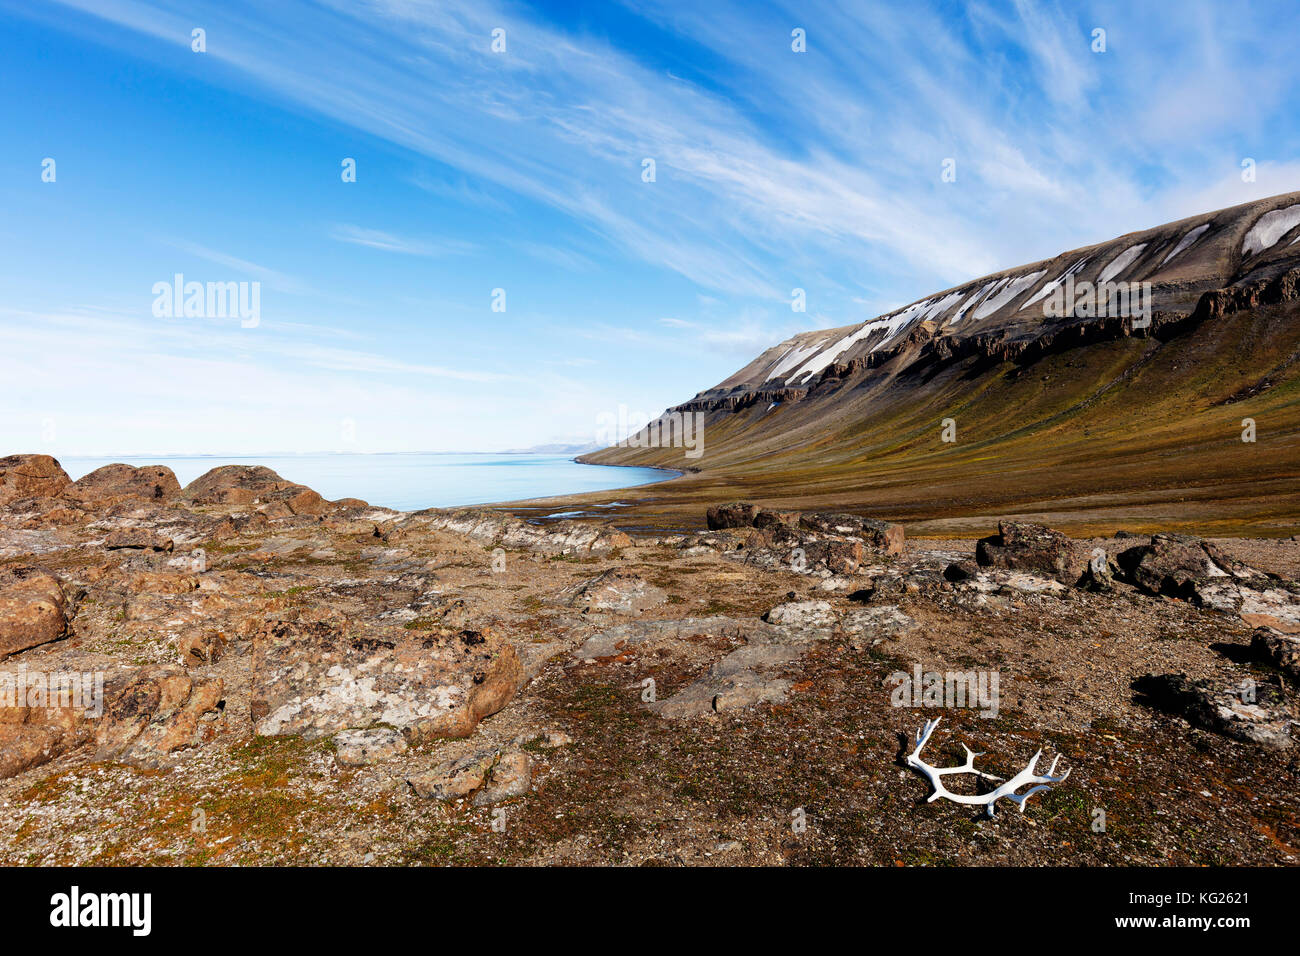 Gehäutet rentier Geweih, kapp Lee, Spitzbergen, Svalbard, Arktis, Norwegen, Europa Stockbild